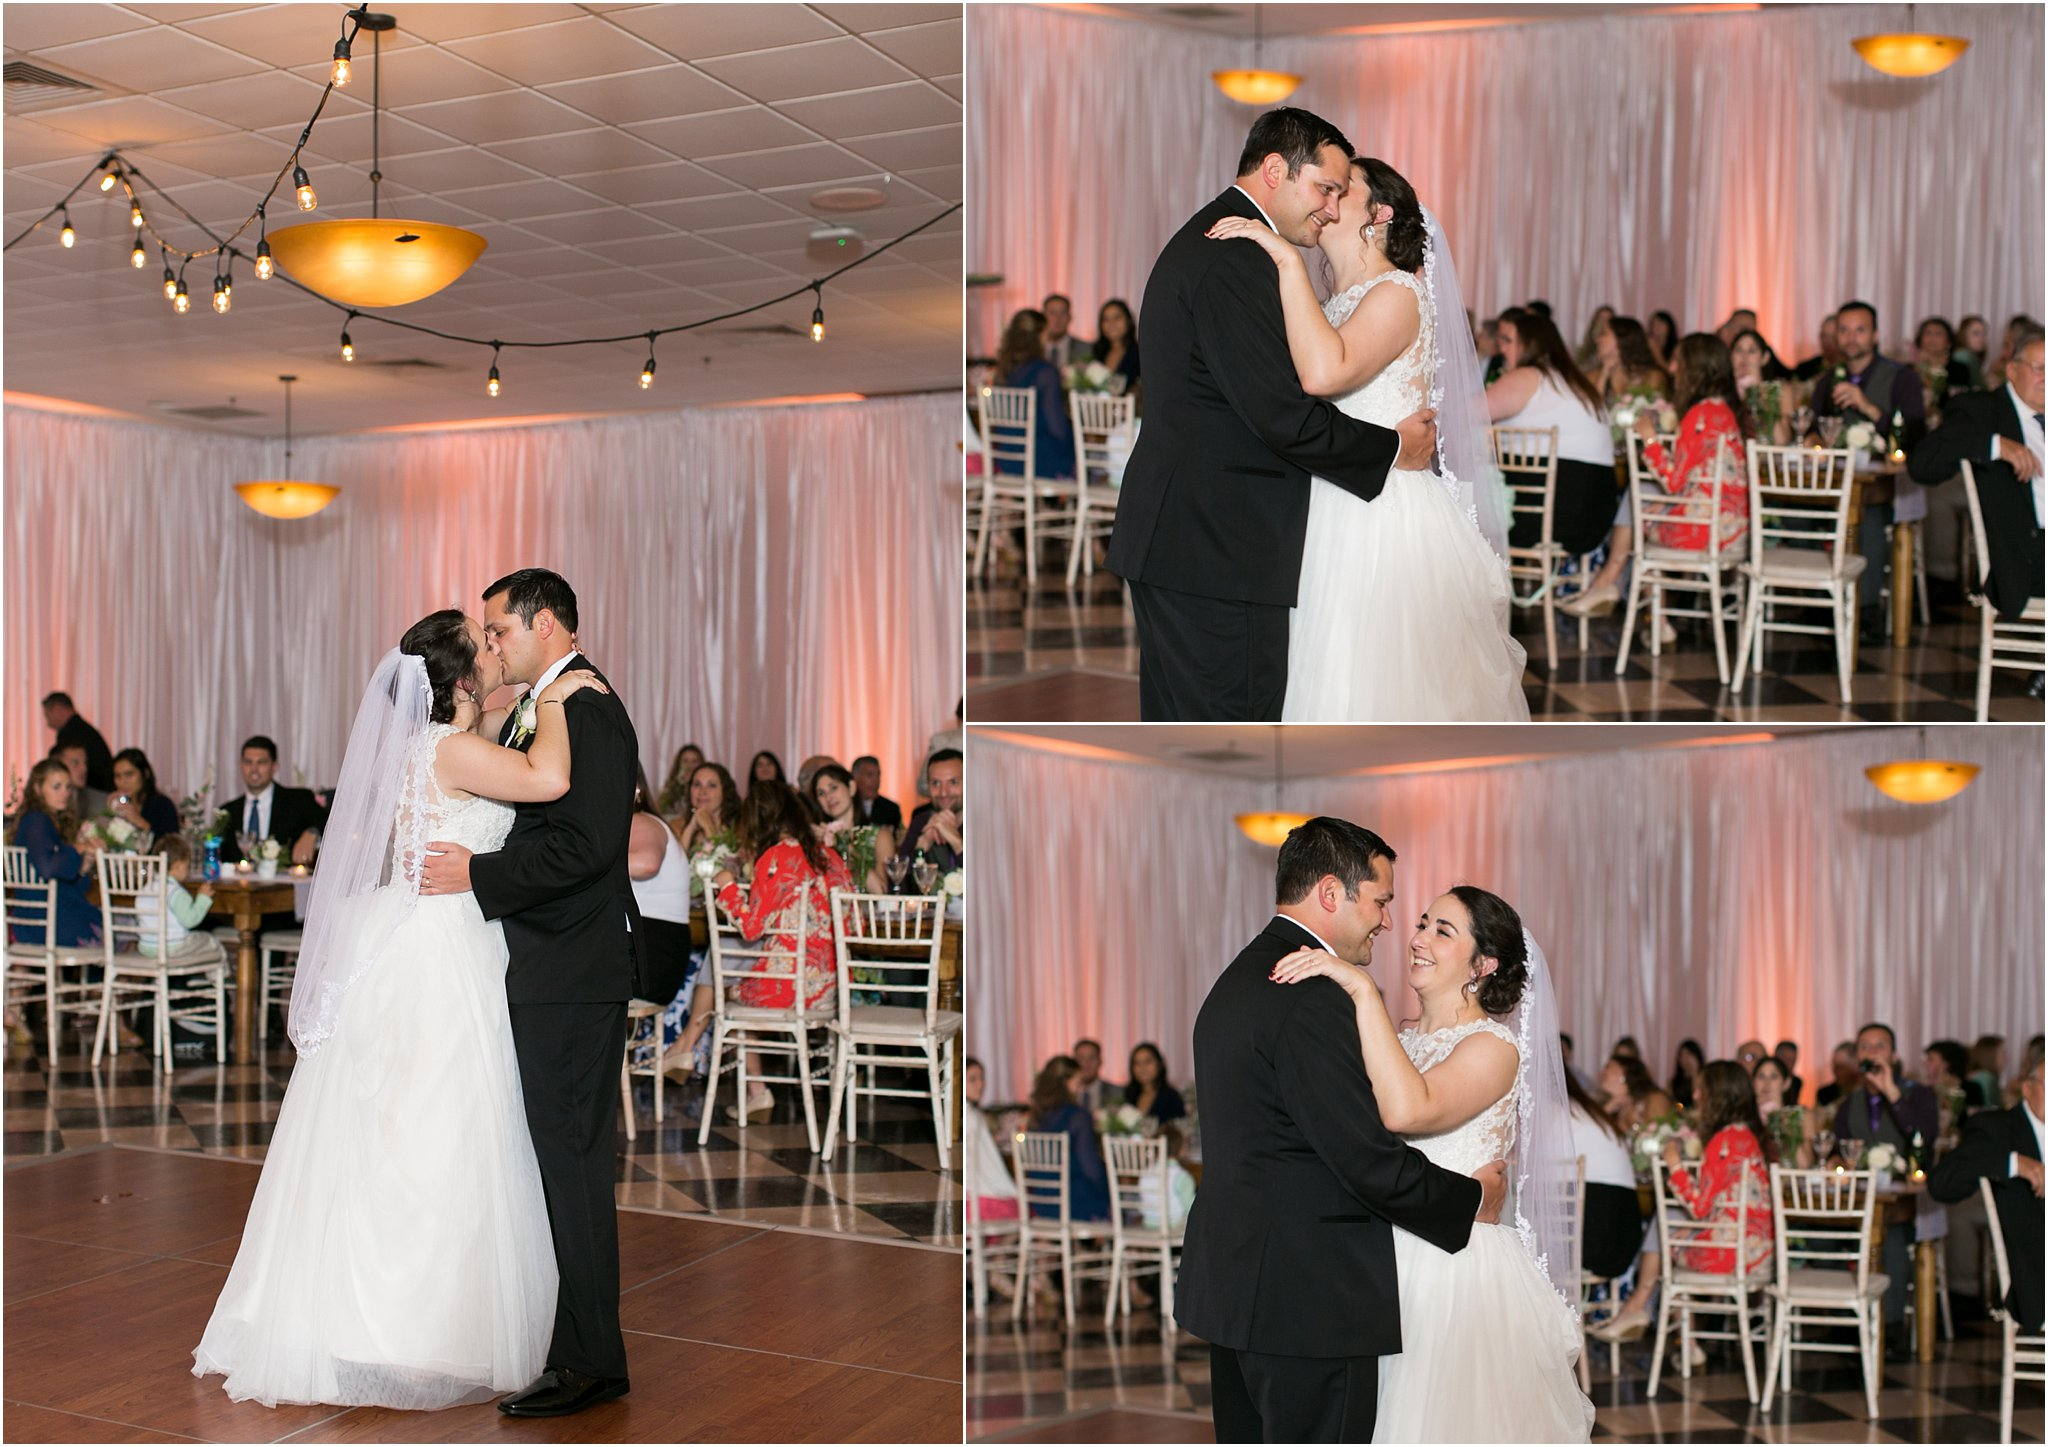 jessica_ryan_photography_virginia_wedding_photographer_wedding_hurricane_norfolk_botanical_gardens_hurricane_matthew_wedding_3628